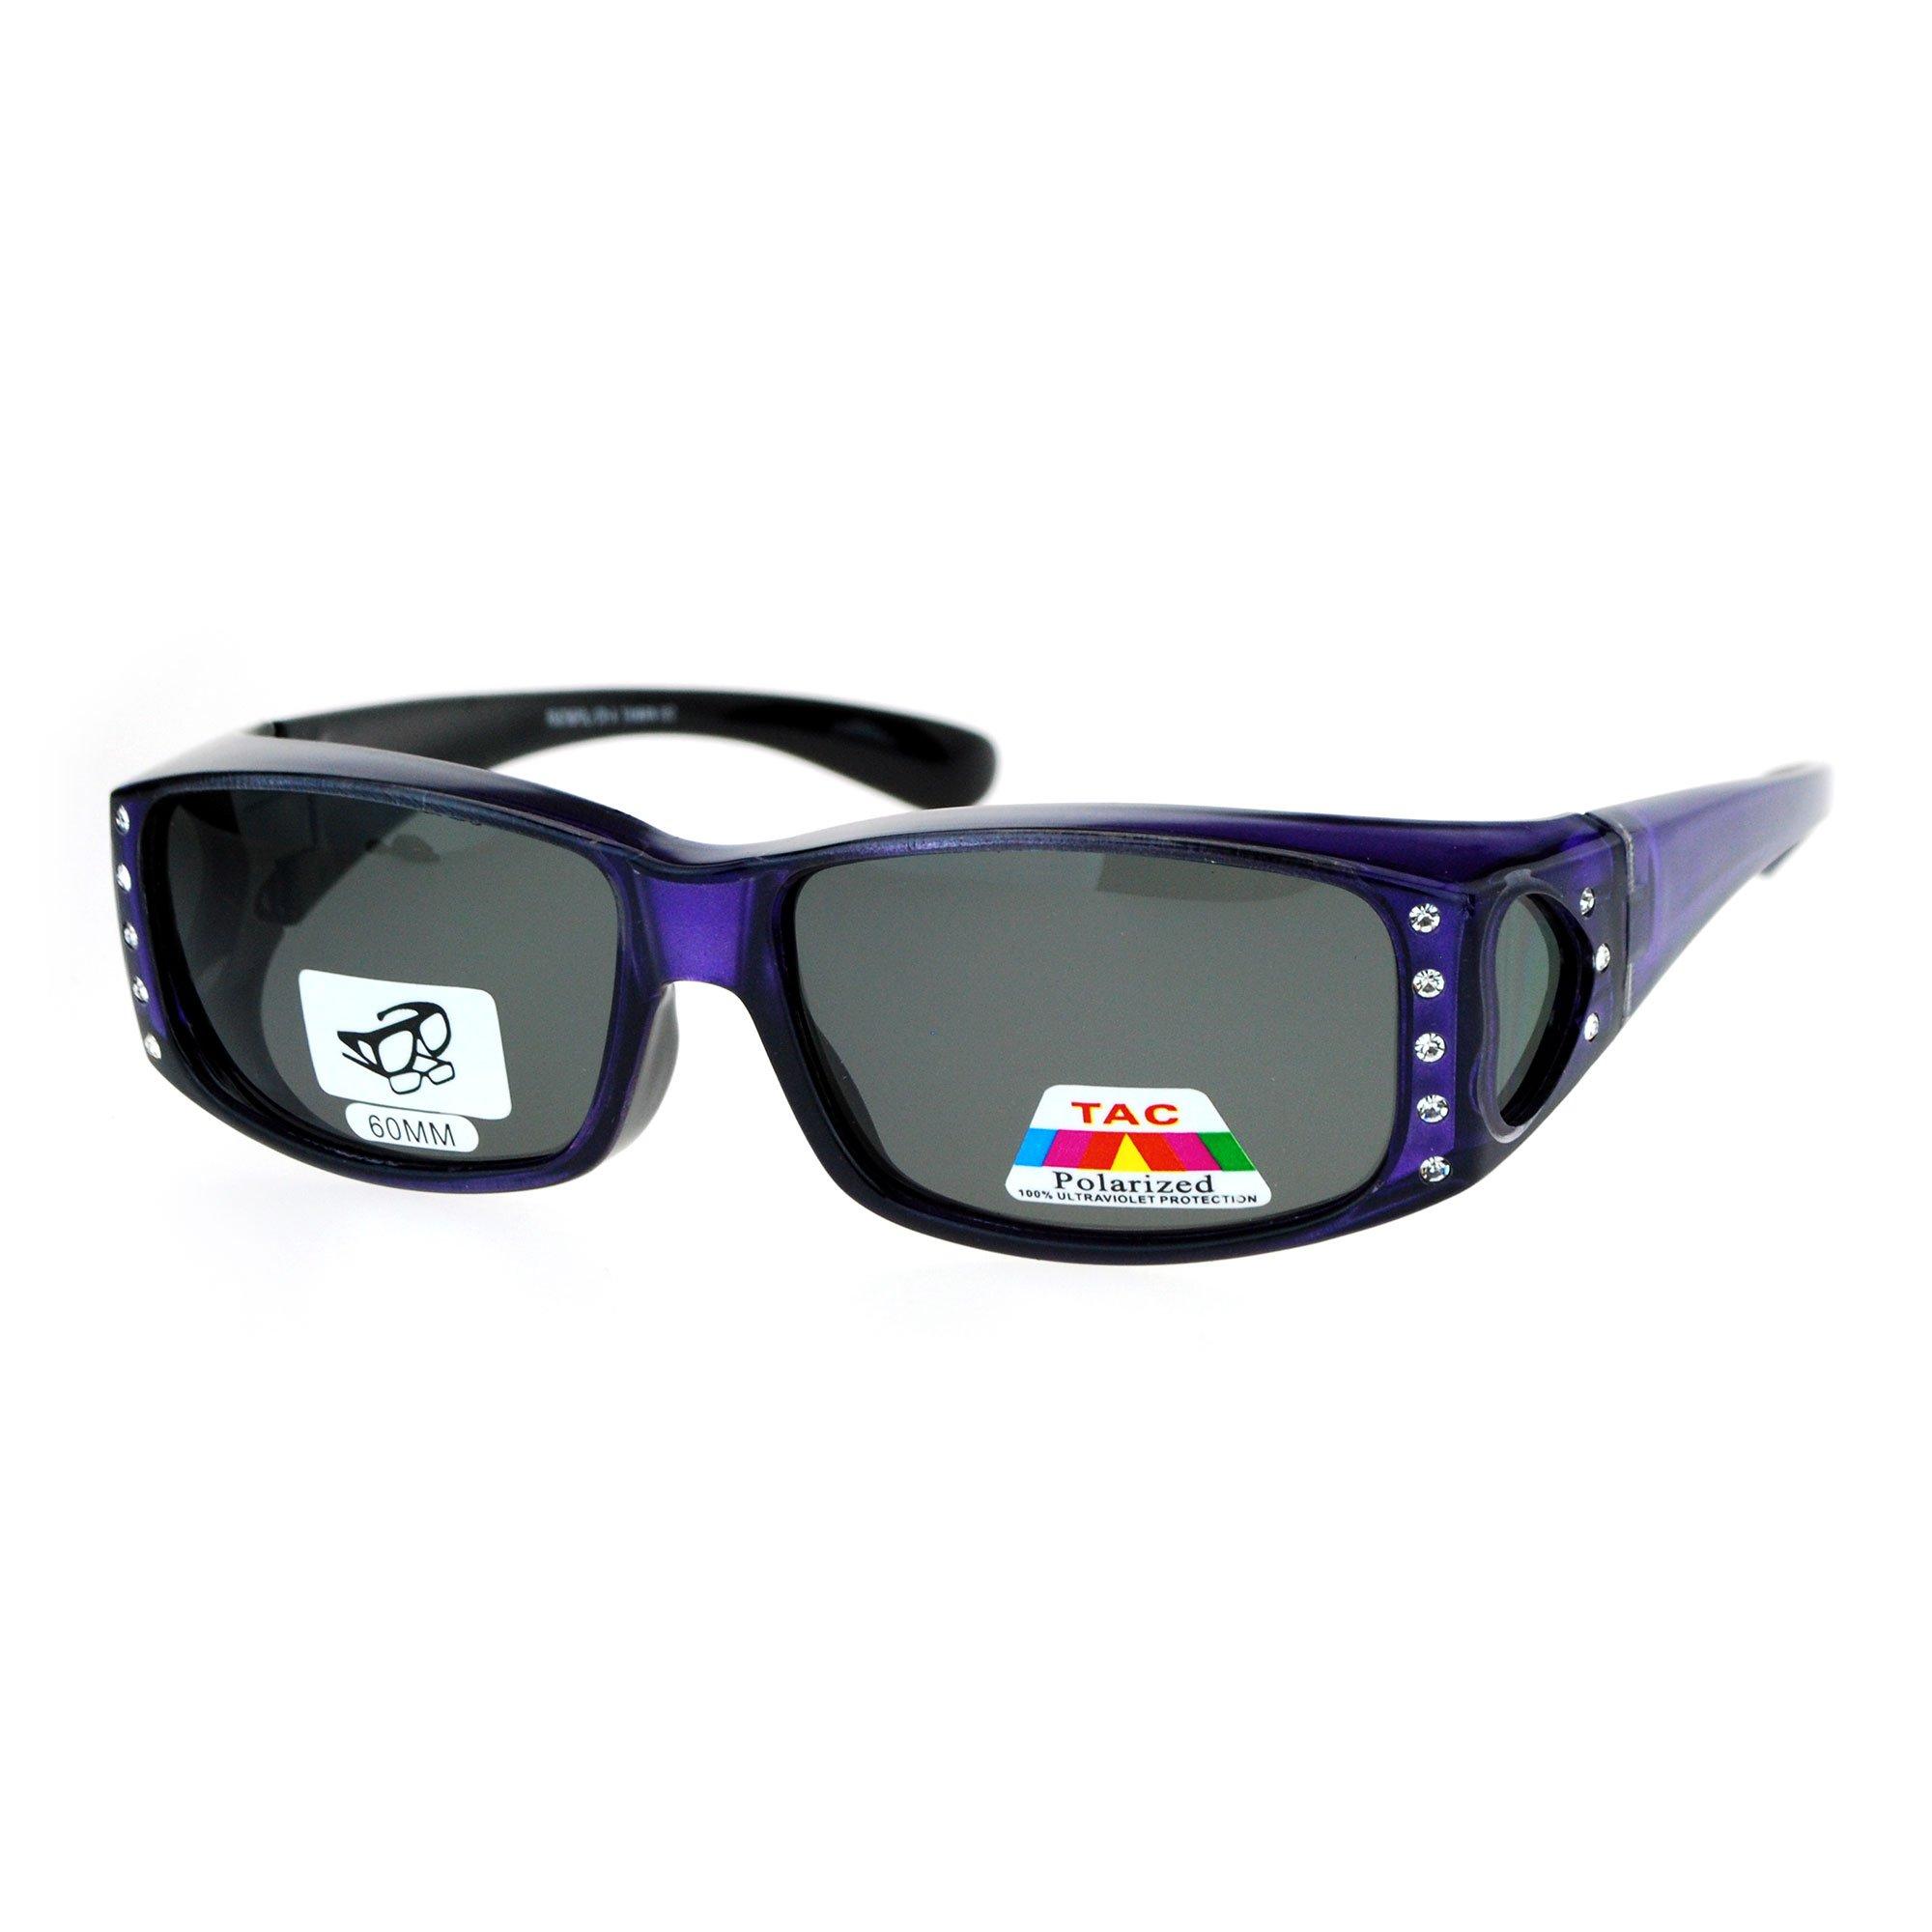 SA106 Womens Rhinestone Polarized Lens Rectangular 60mm Fit Over Sunglasses Purple